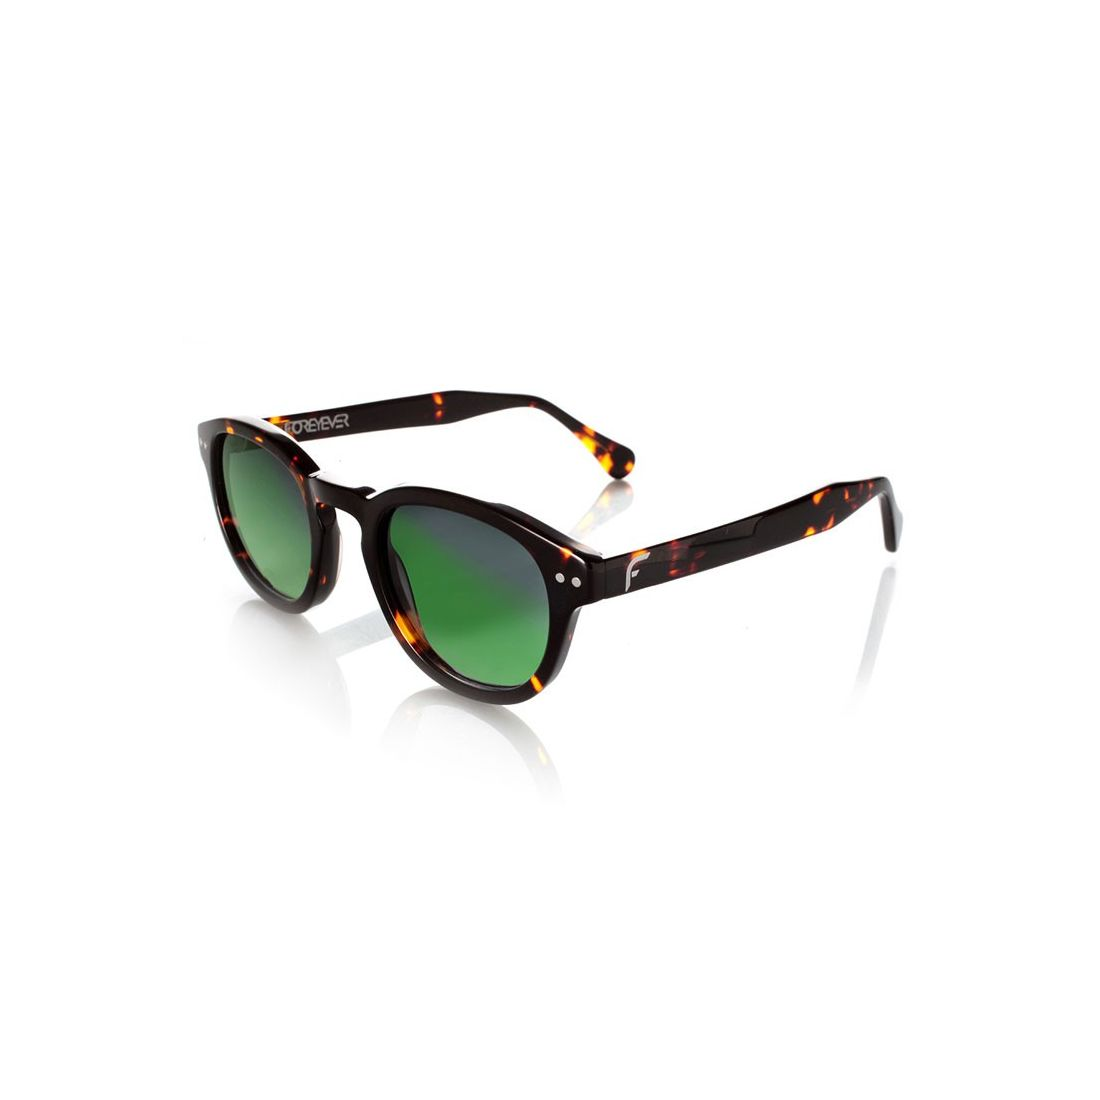 b7d8cd432cc ... BROWN SUGAR - with green polarized lenses ...